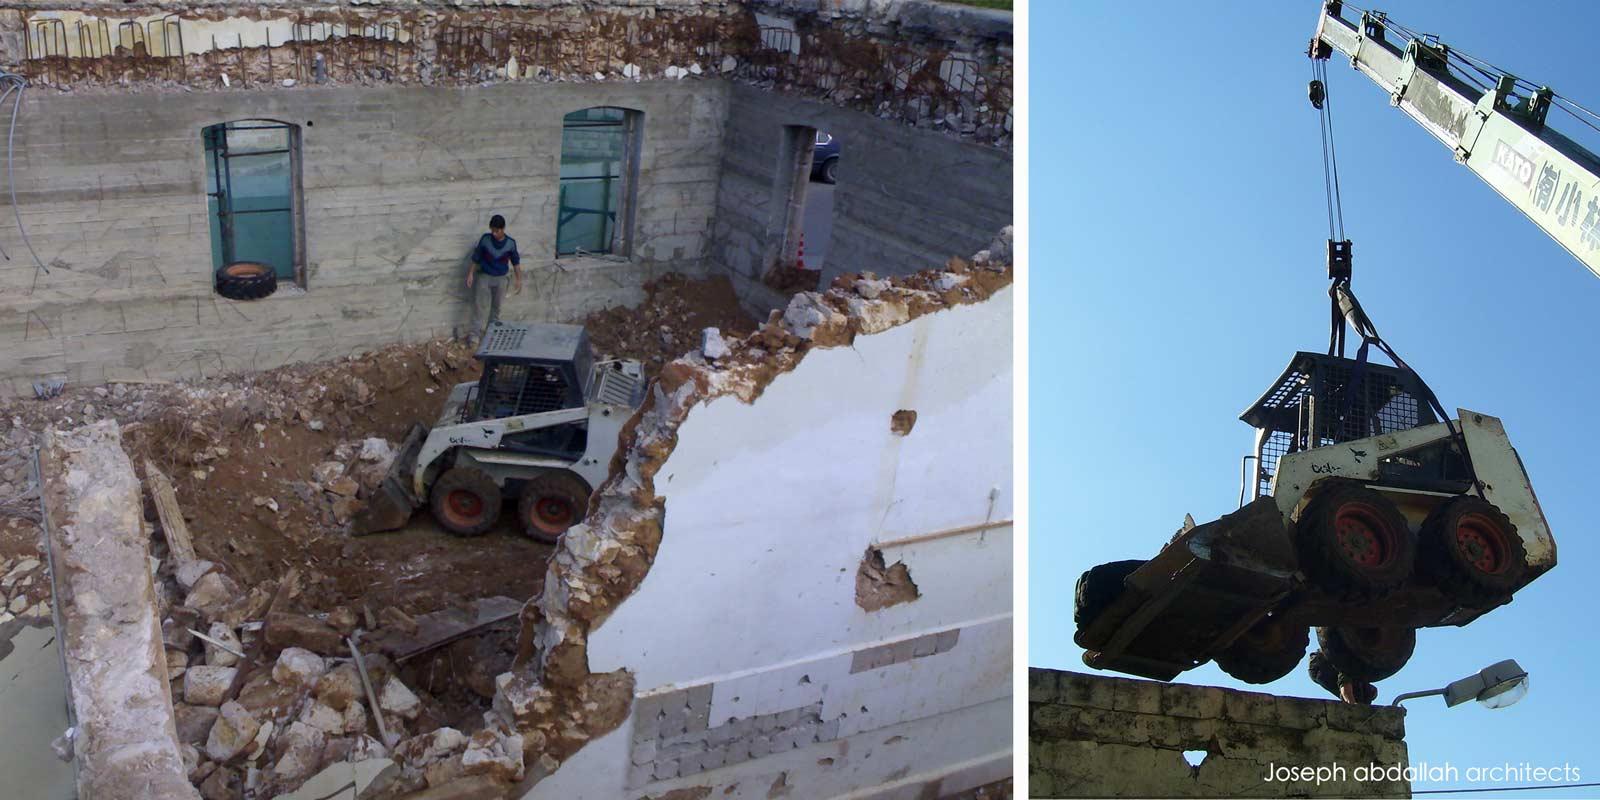 bank-lcb-sgbl-apotres-restoration-architecture-joseph-abdallah-architects-5